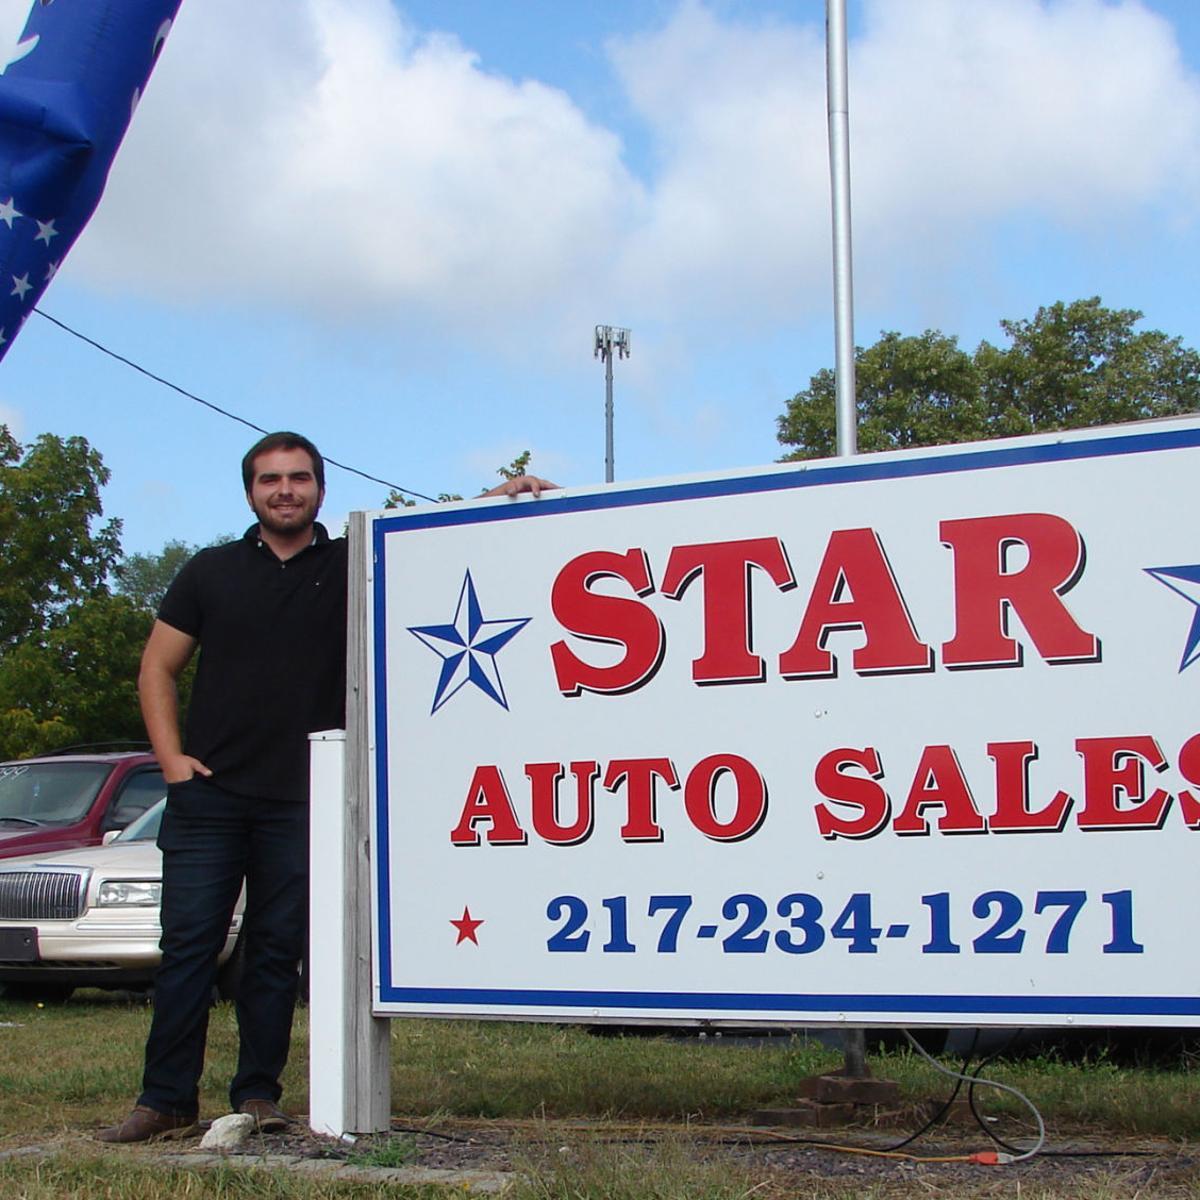 Star Motor Sales >> Star Auto Sales Open In Mattoon Local Jg Tc Com